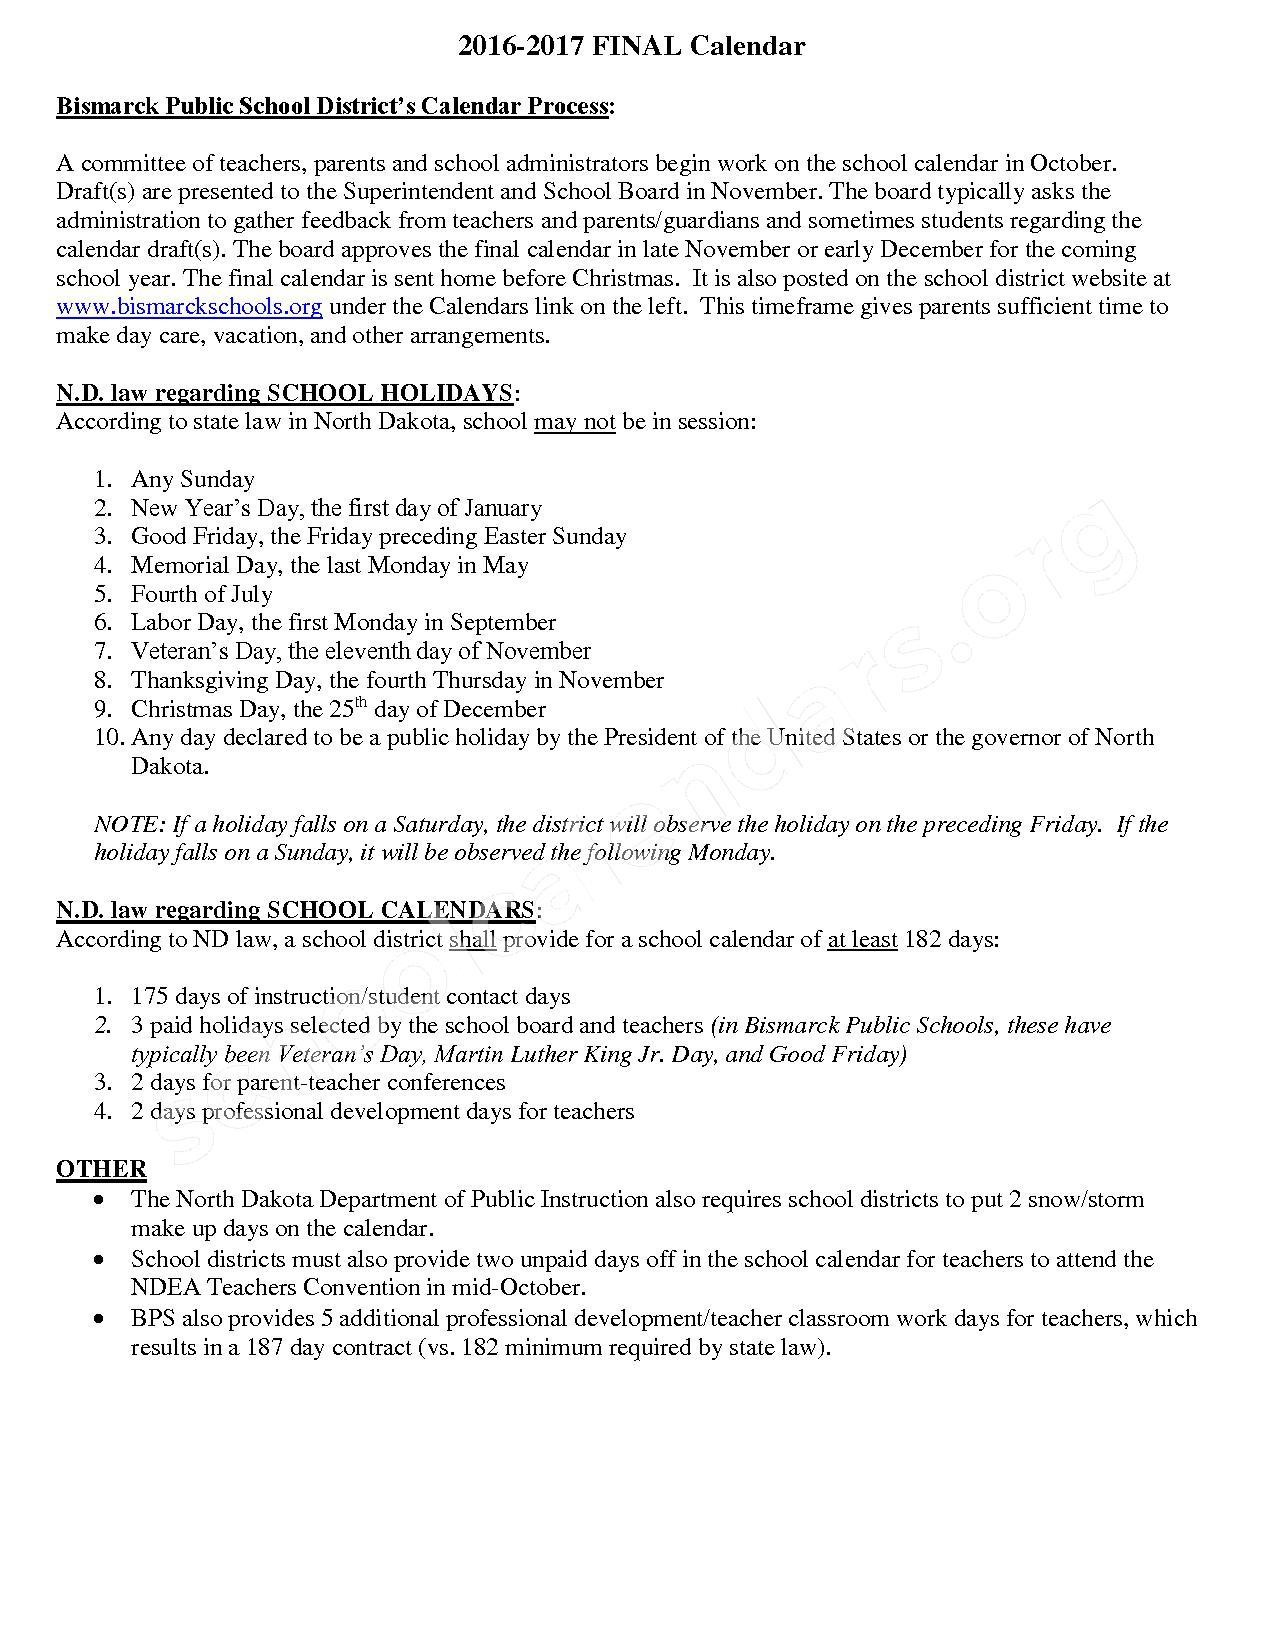 2016 - 2017 School Calendar – South Central Alternative School – page 2